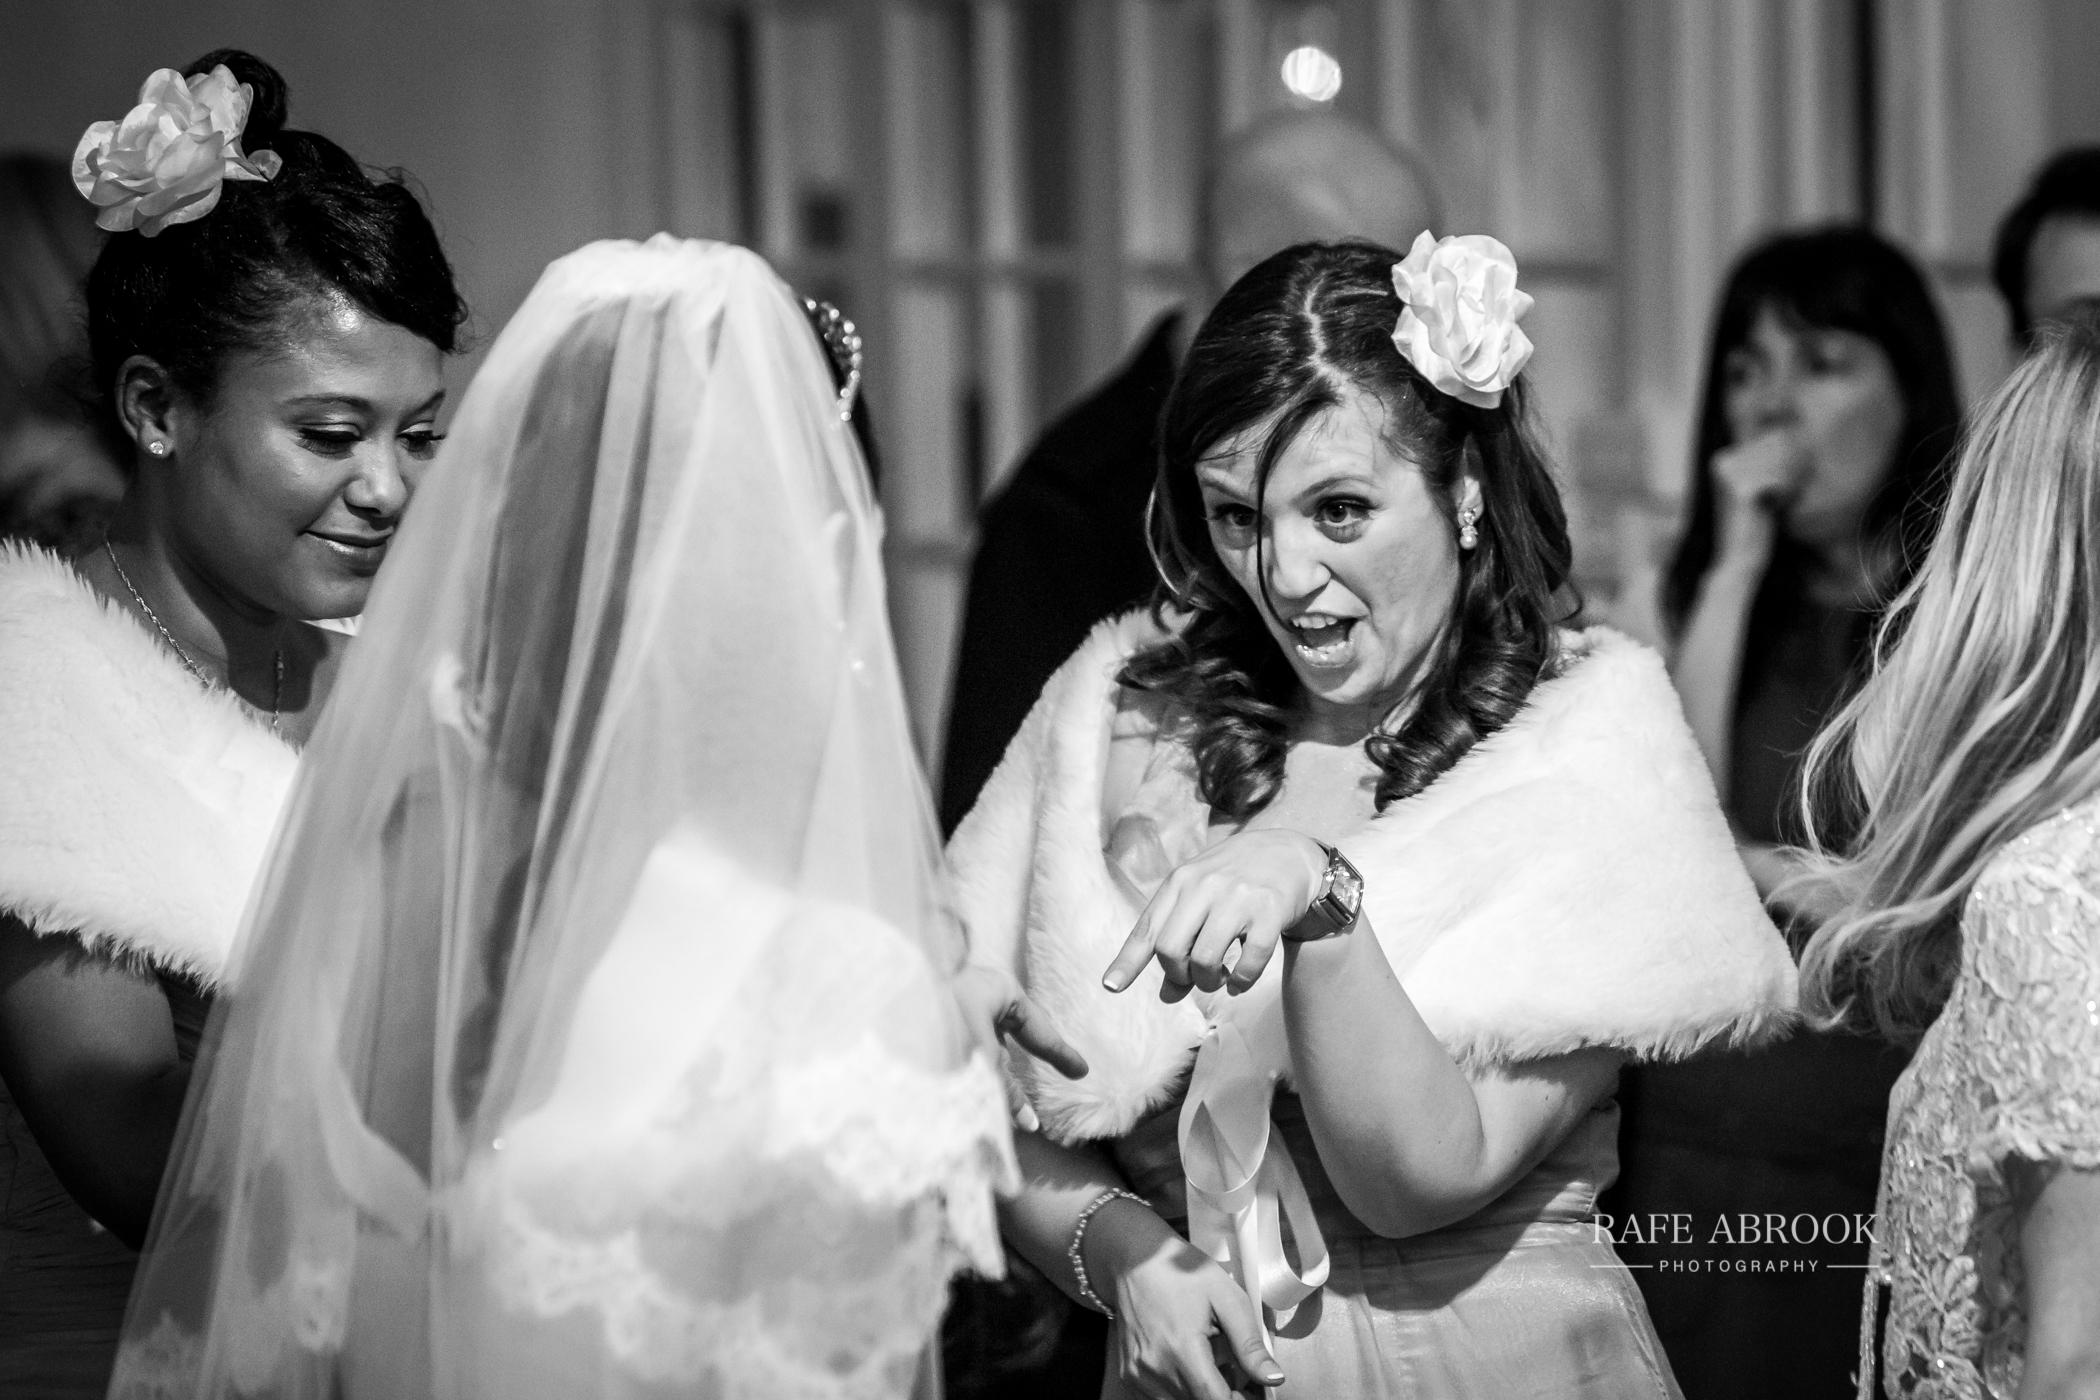 roma & pete wedding hampstead shenley hertfordshire -547.jpg